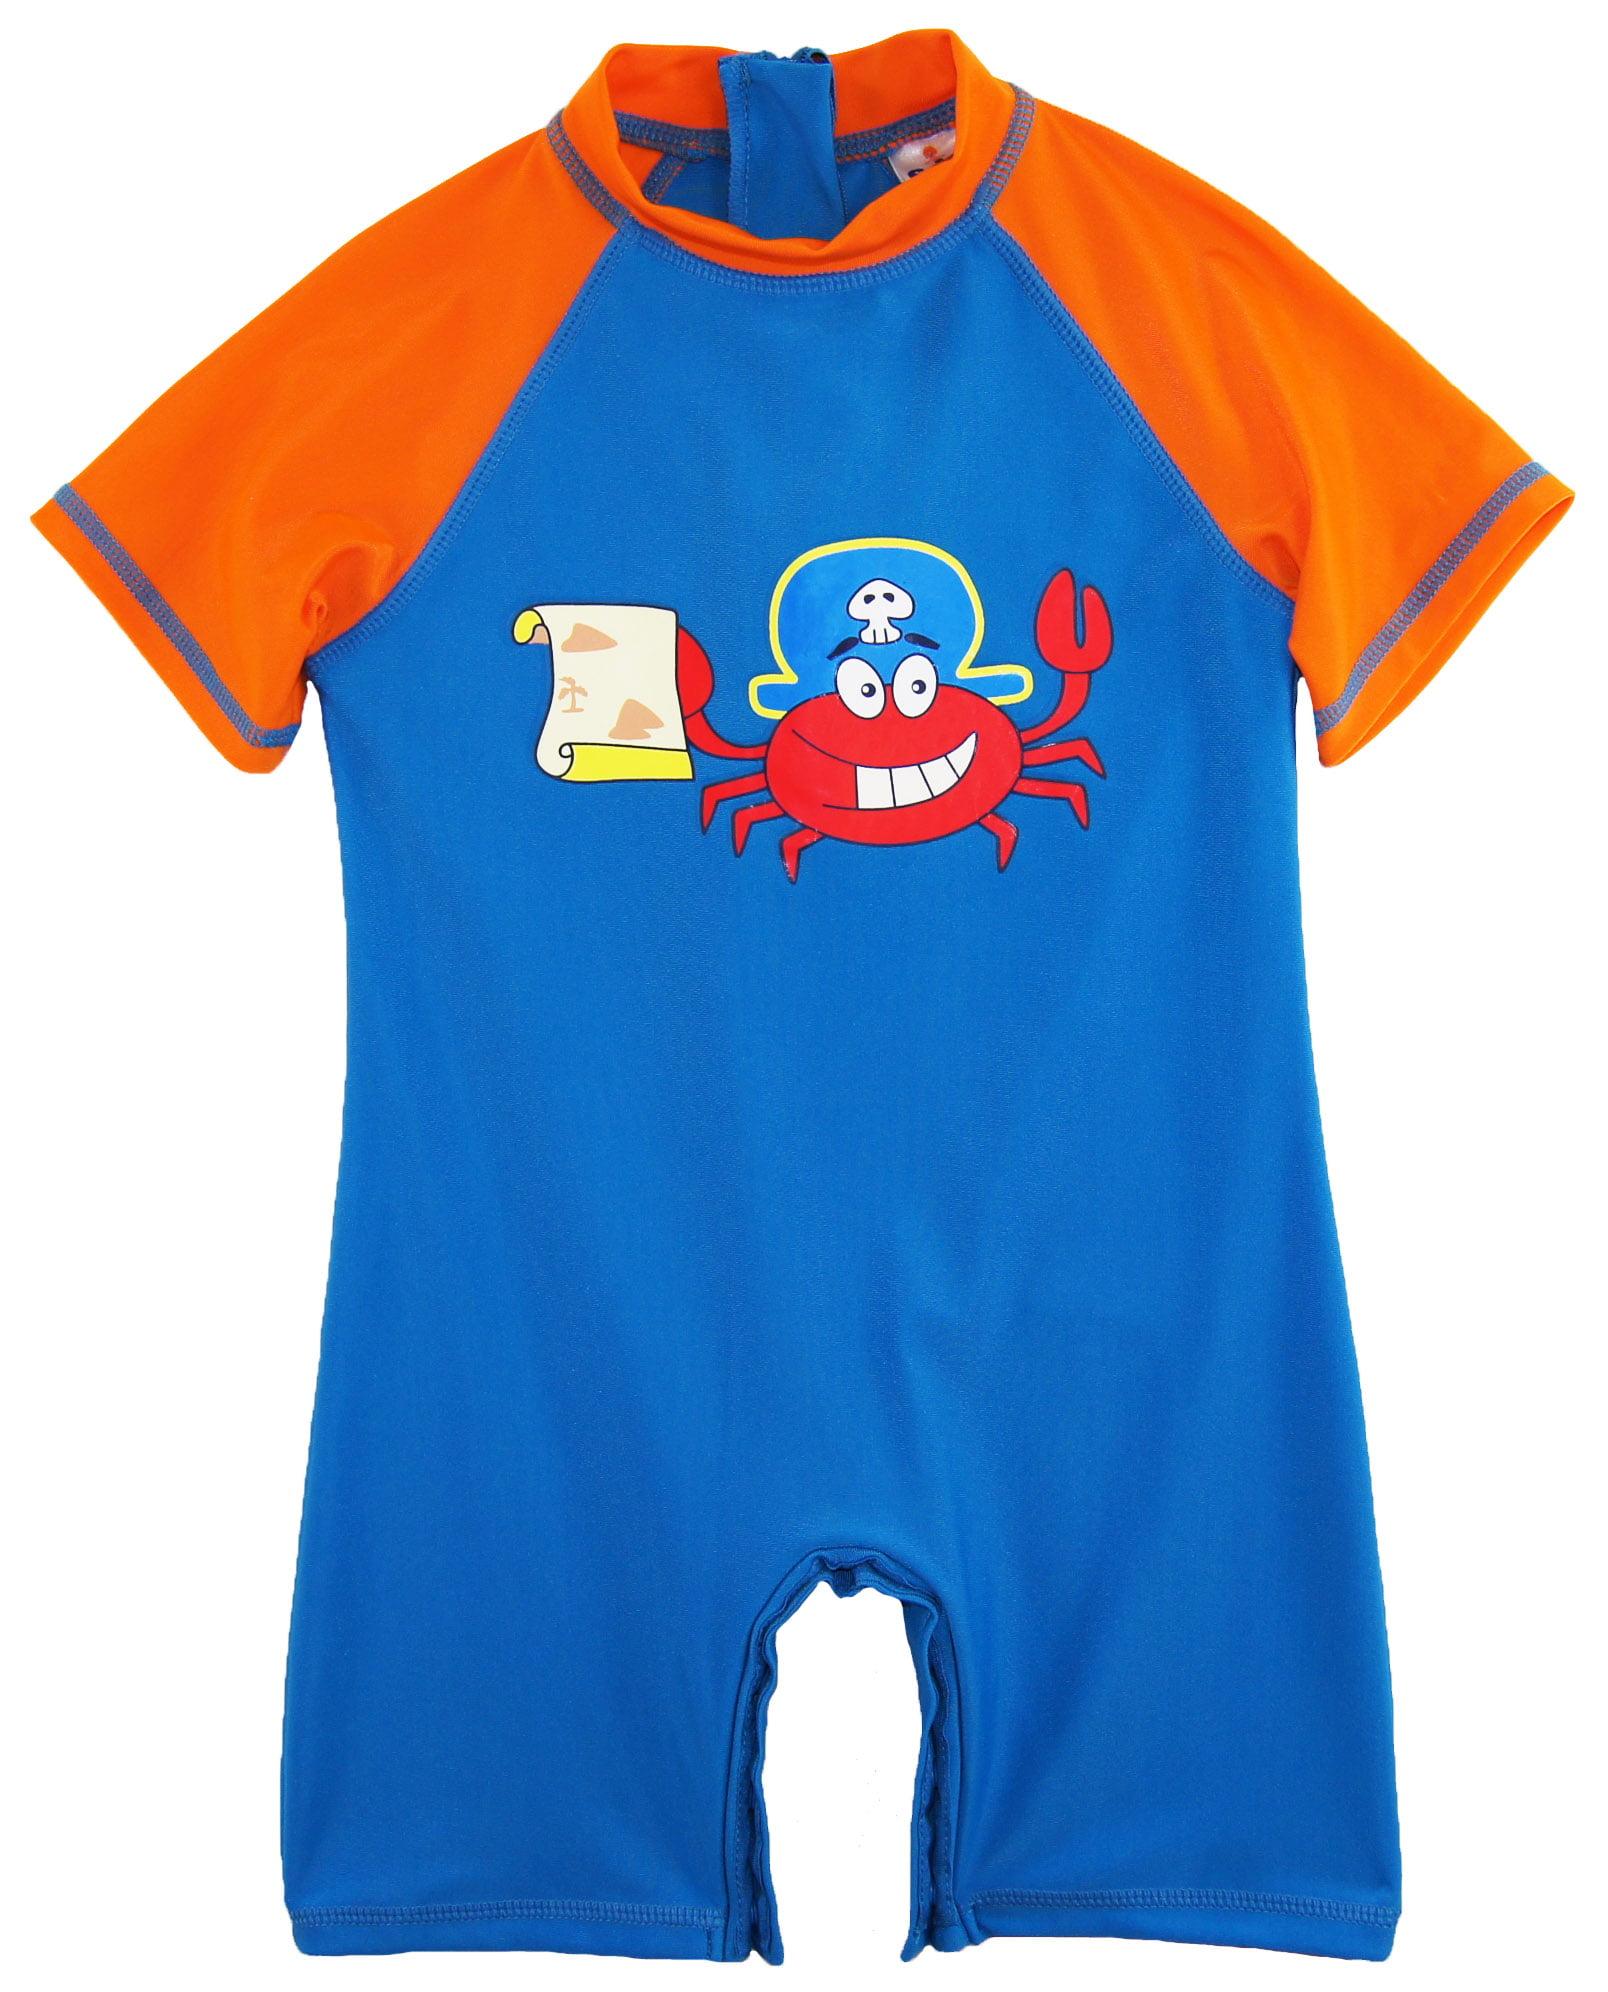 Sweet & Soft Toddler Boys Swimwear Cute Pirate Crabby Rashguard Sunsuit Swimsuit UPF 50+ size 4T